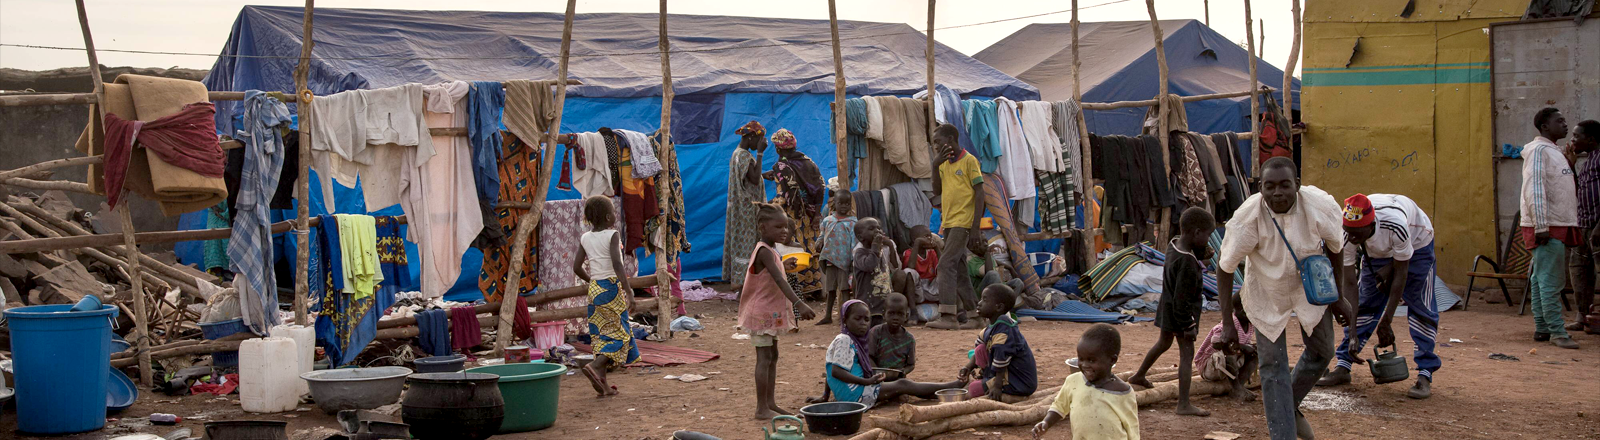 Ein Flüchtlingscamp in Bamako, Mali